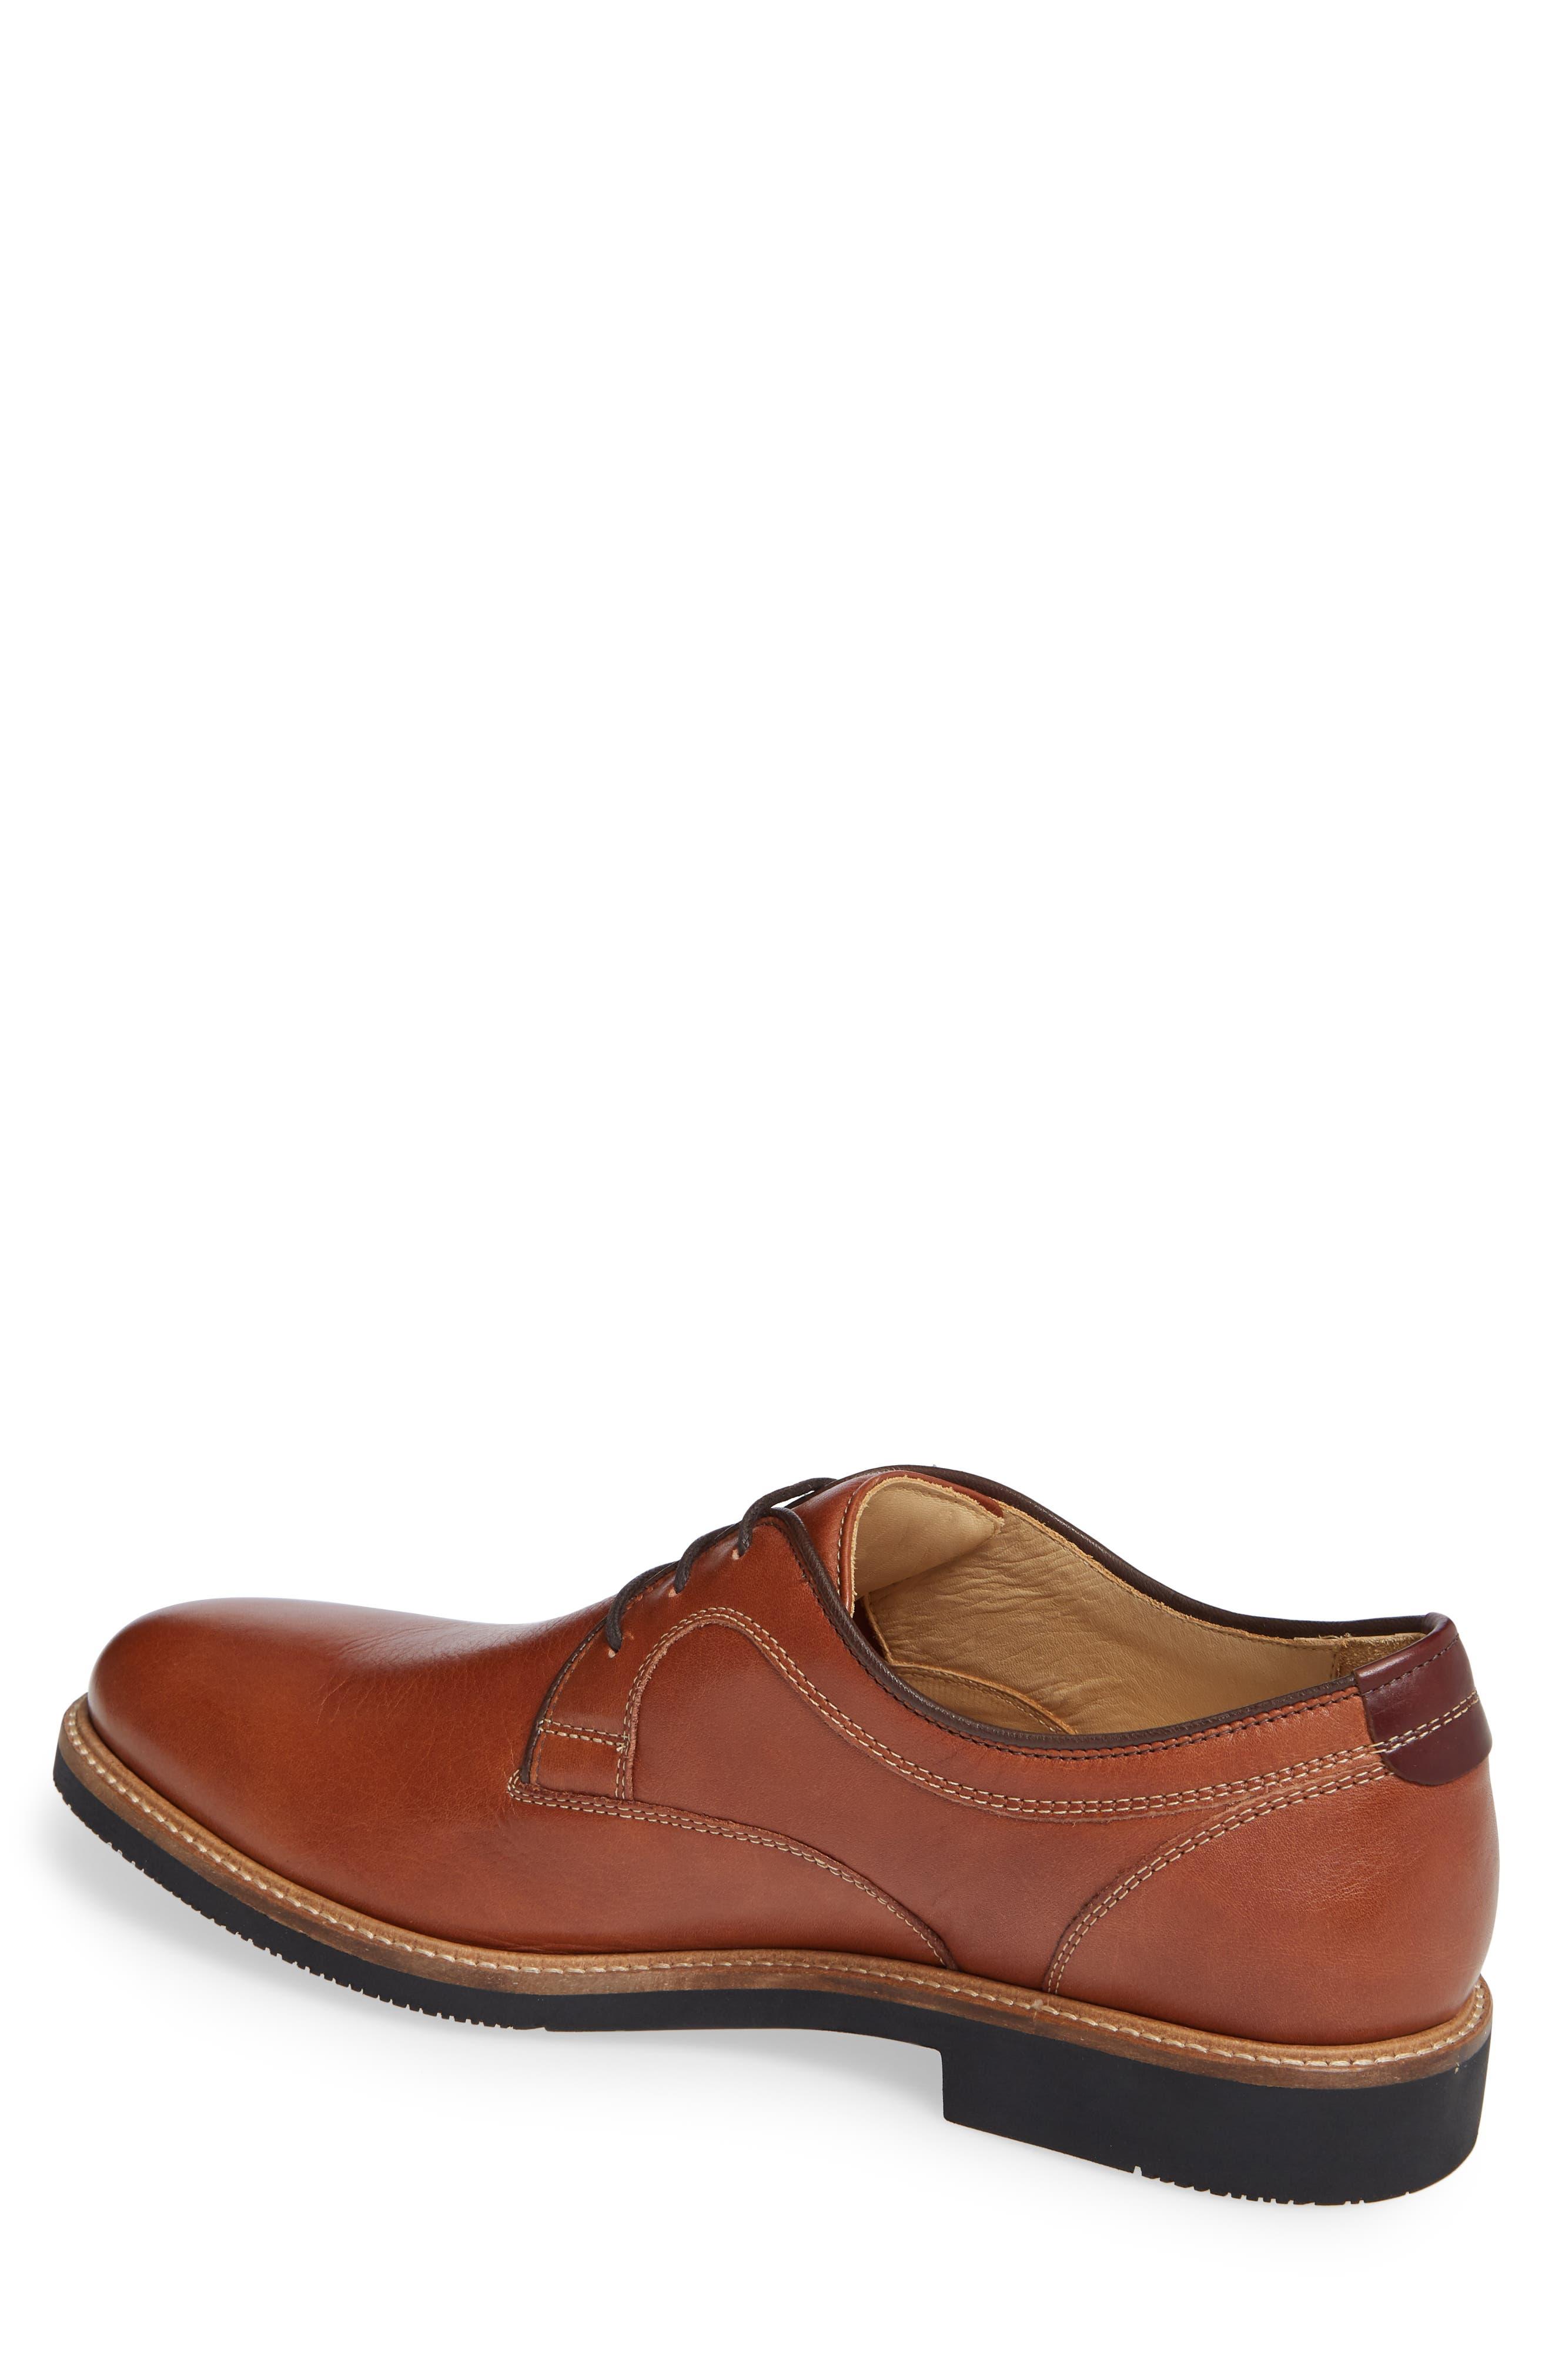 Barlow Plain Toe Derby,                             Alternate thumbnail 2, color,                             Dark Tan Leather